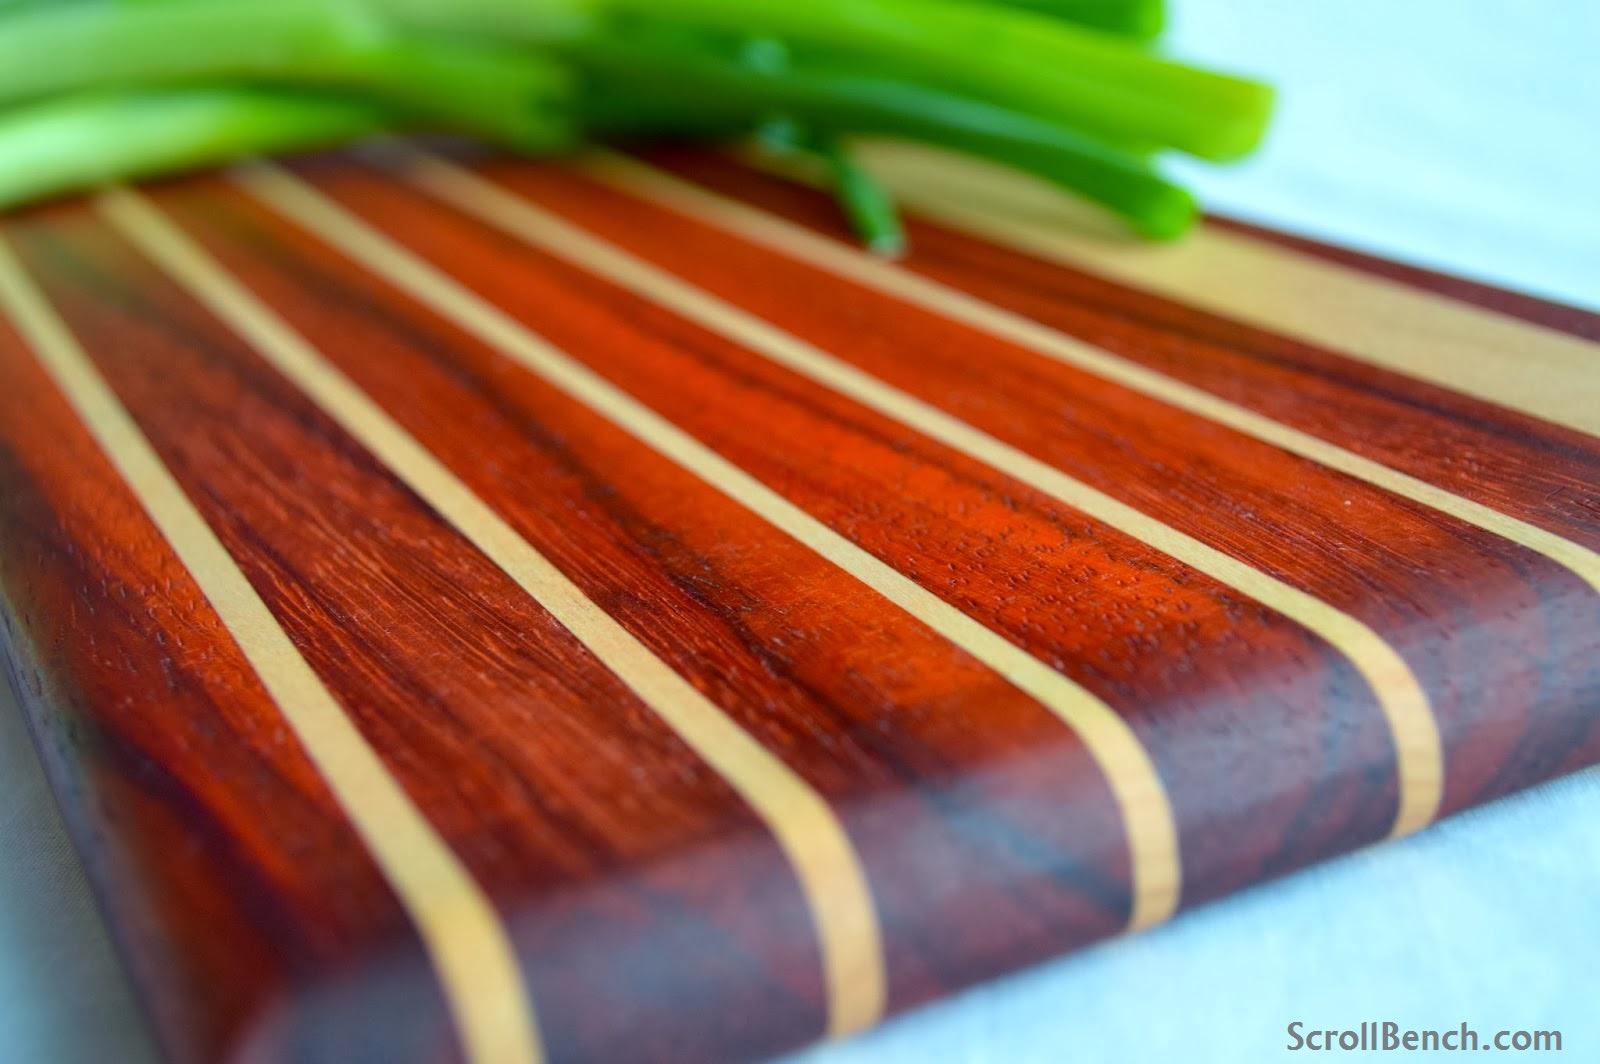 Hardwood Cutting Boards ~ Scroll bench making of exotic hardwood cutting boards